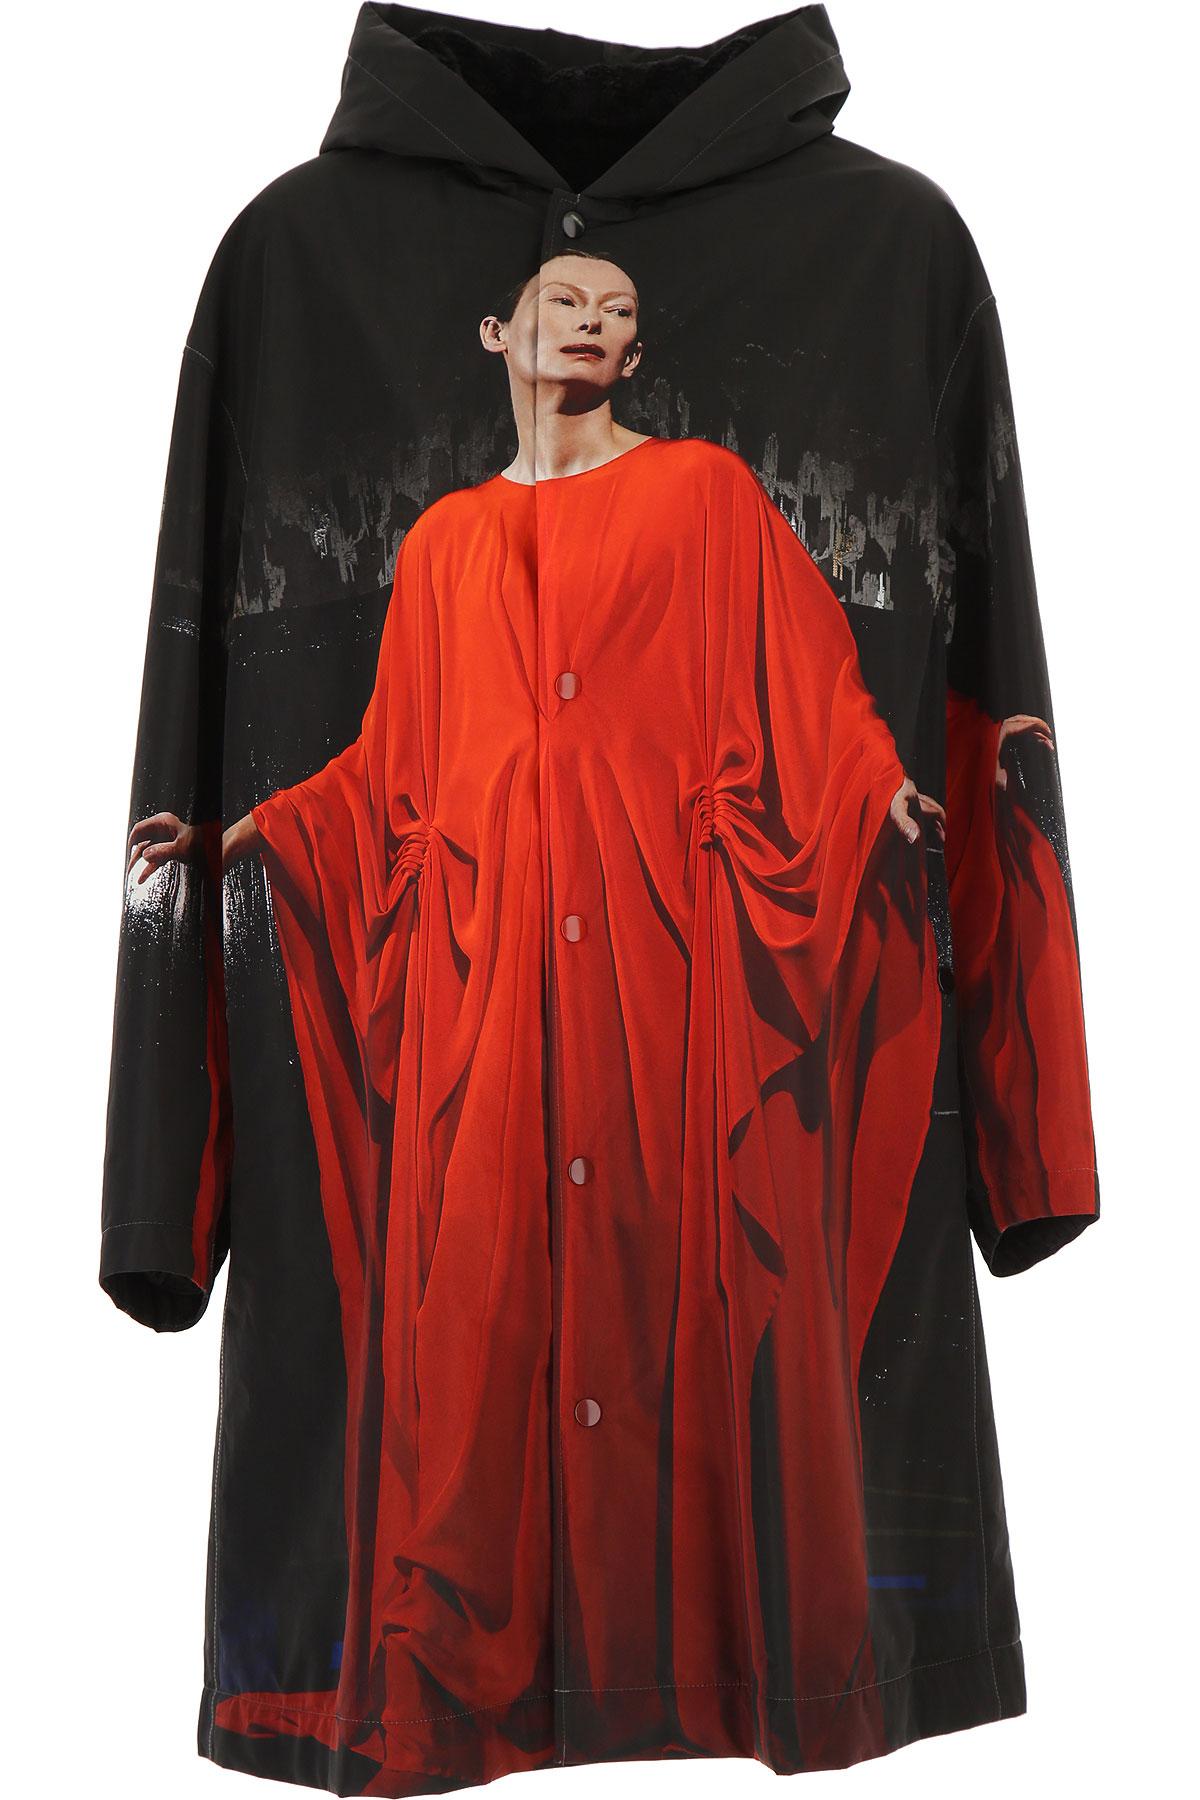 032c Down Jacket for Women, Puffer Ski Jacket On Sale, Black, polyester, 2019, 1 - S - IT 40 2 - M - IT 42